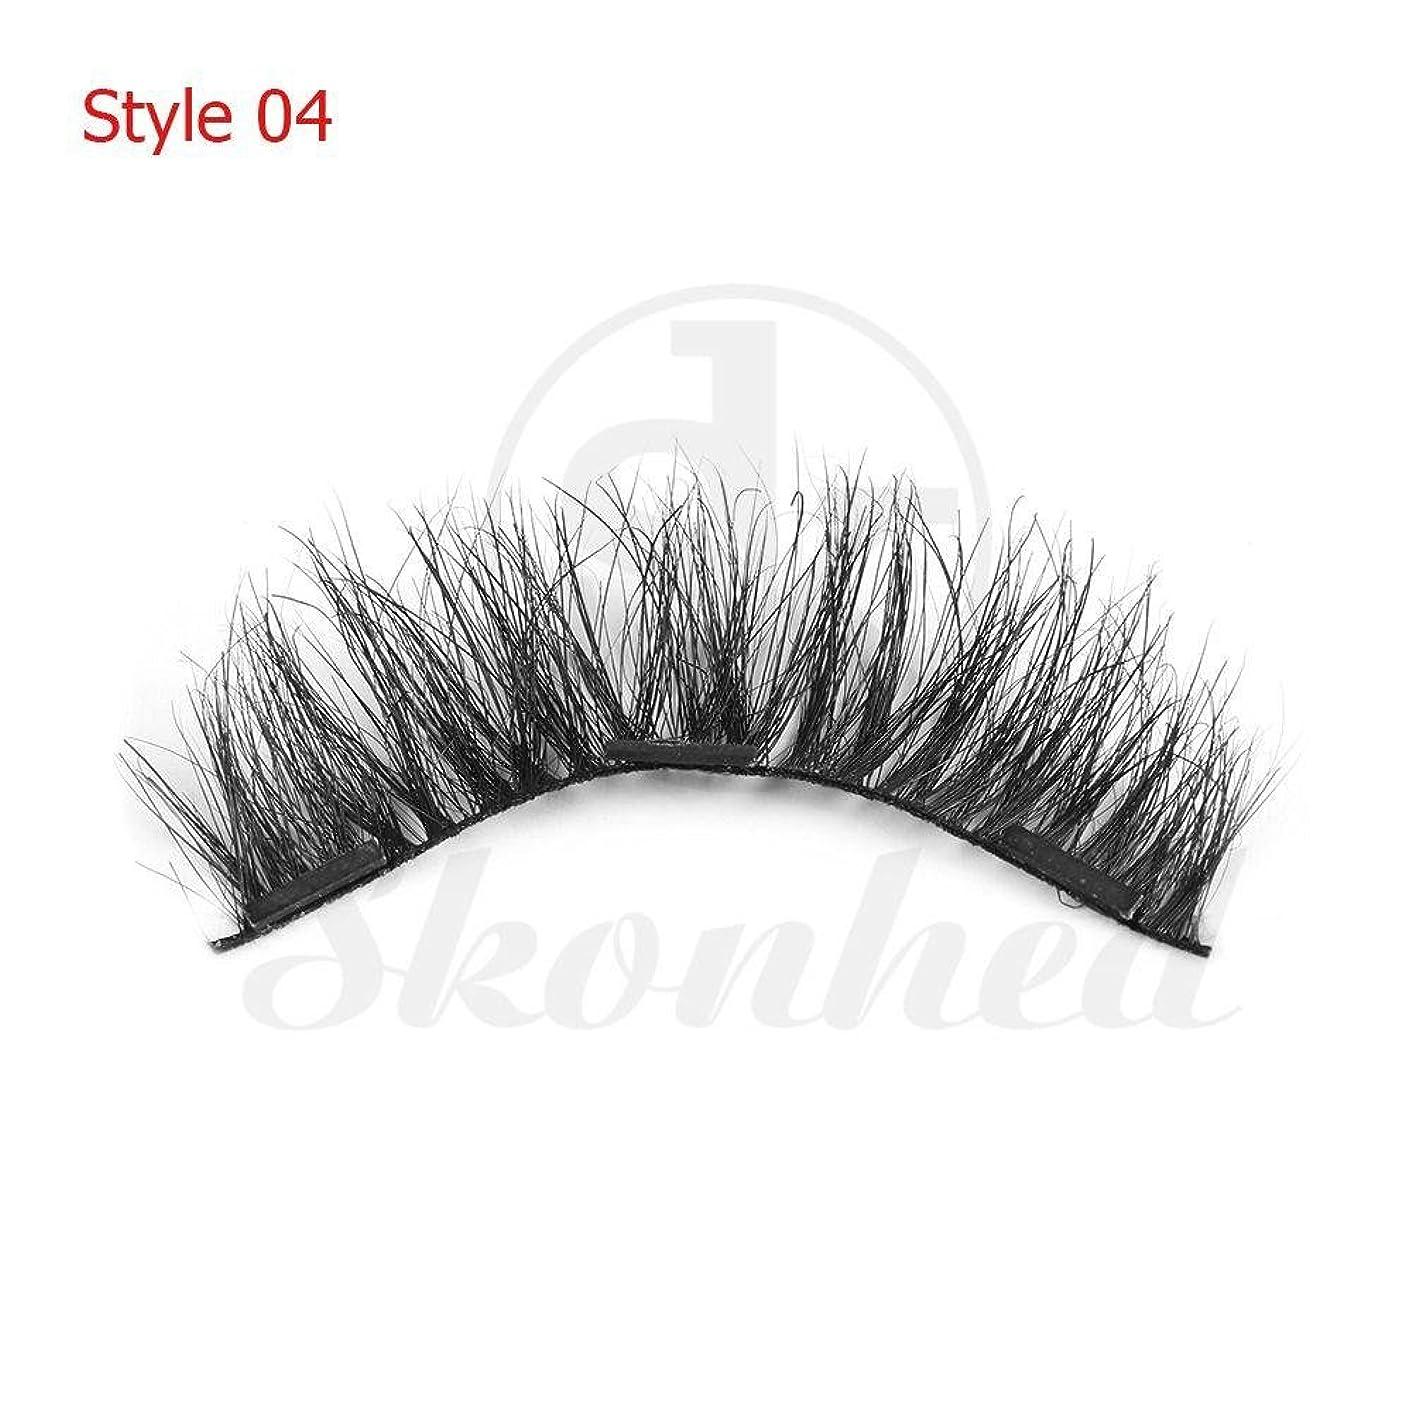 Oceaneshop SKONHED 4 Pcs Lashes /Box Fashion Natural Handmade Triple Magnetic Horse Hair False Eyelashes Messy Wispy